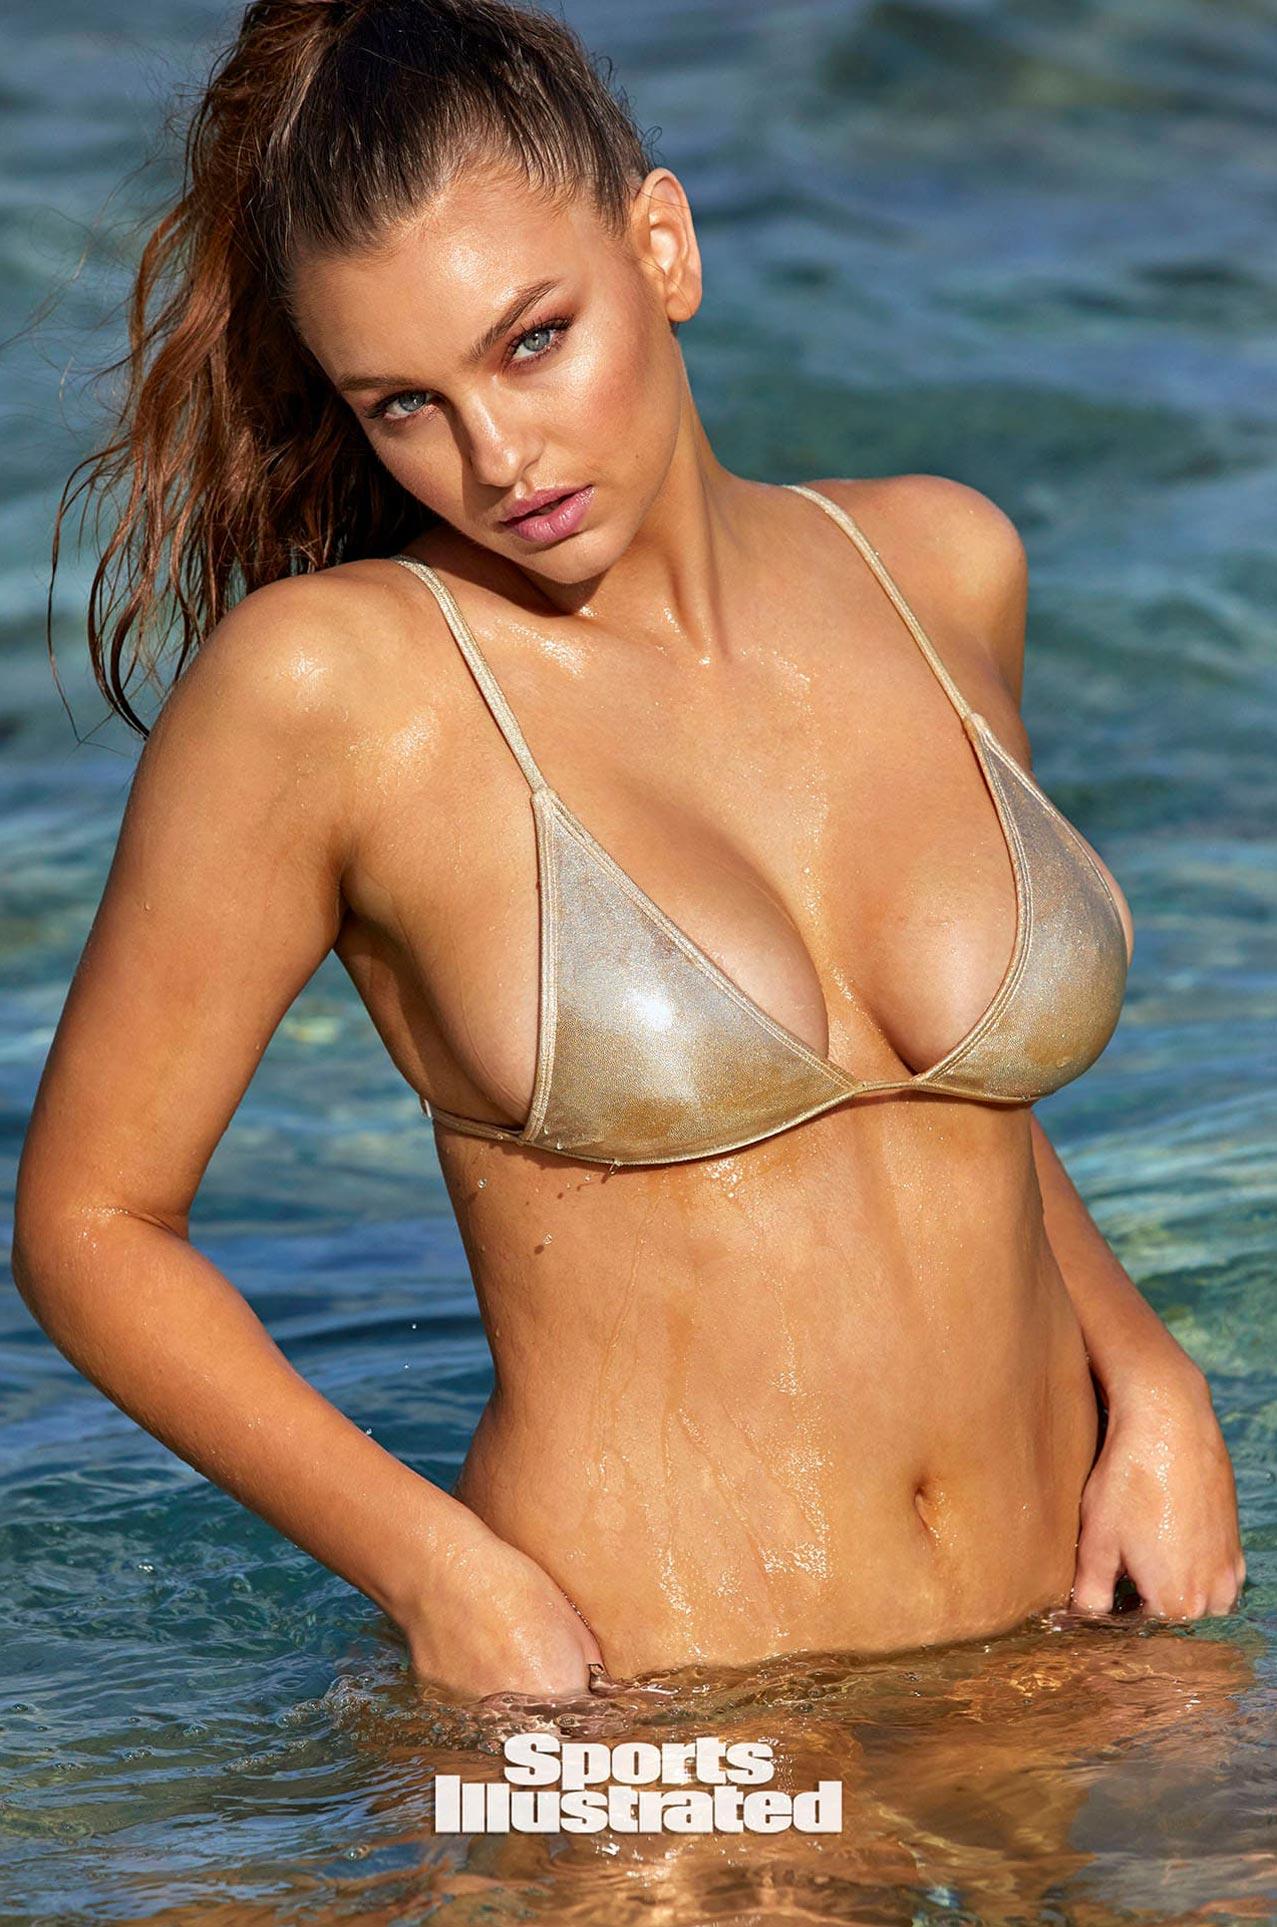 Оливия Брауэр в каталоге купальников Sports Illustrated Swimsuit 2020 / фото 08